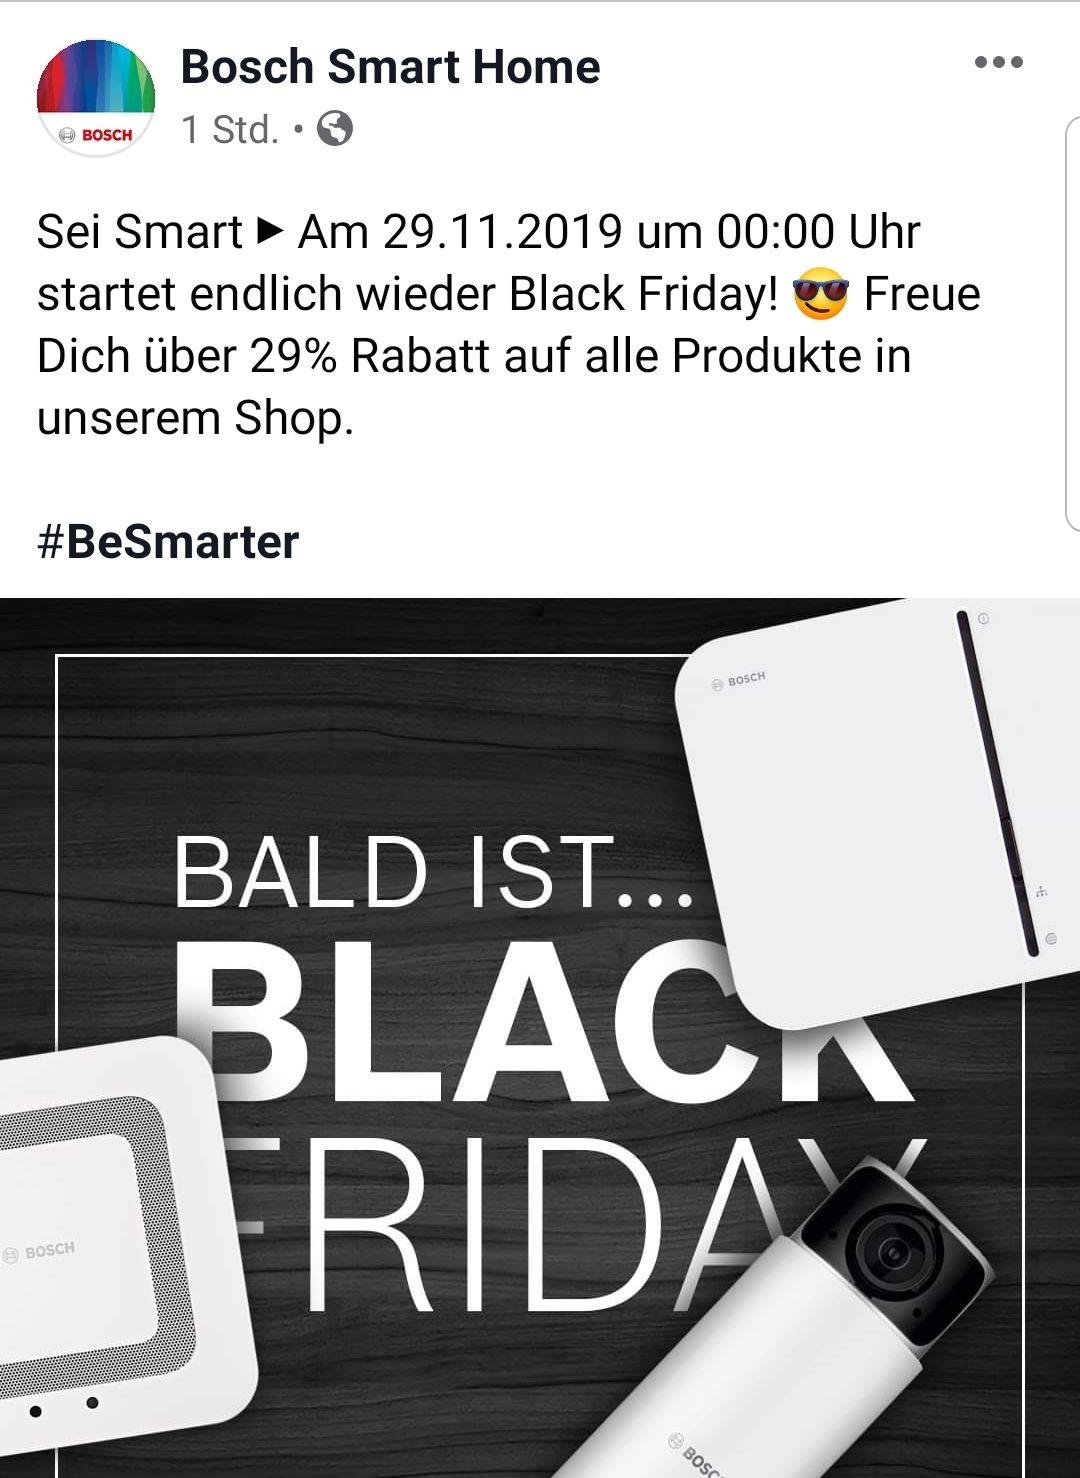 Bosch Smart Home Shop 29% Rabatt zum Black Friday